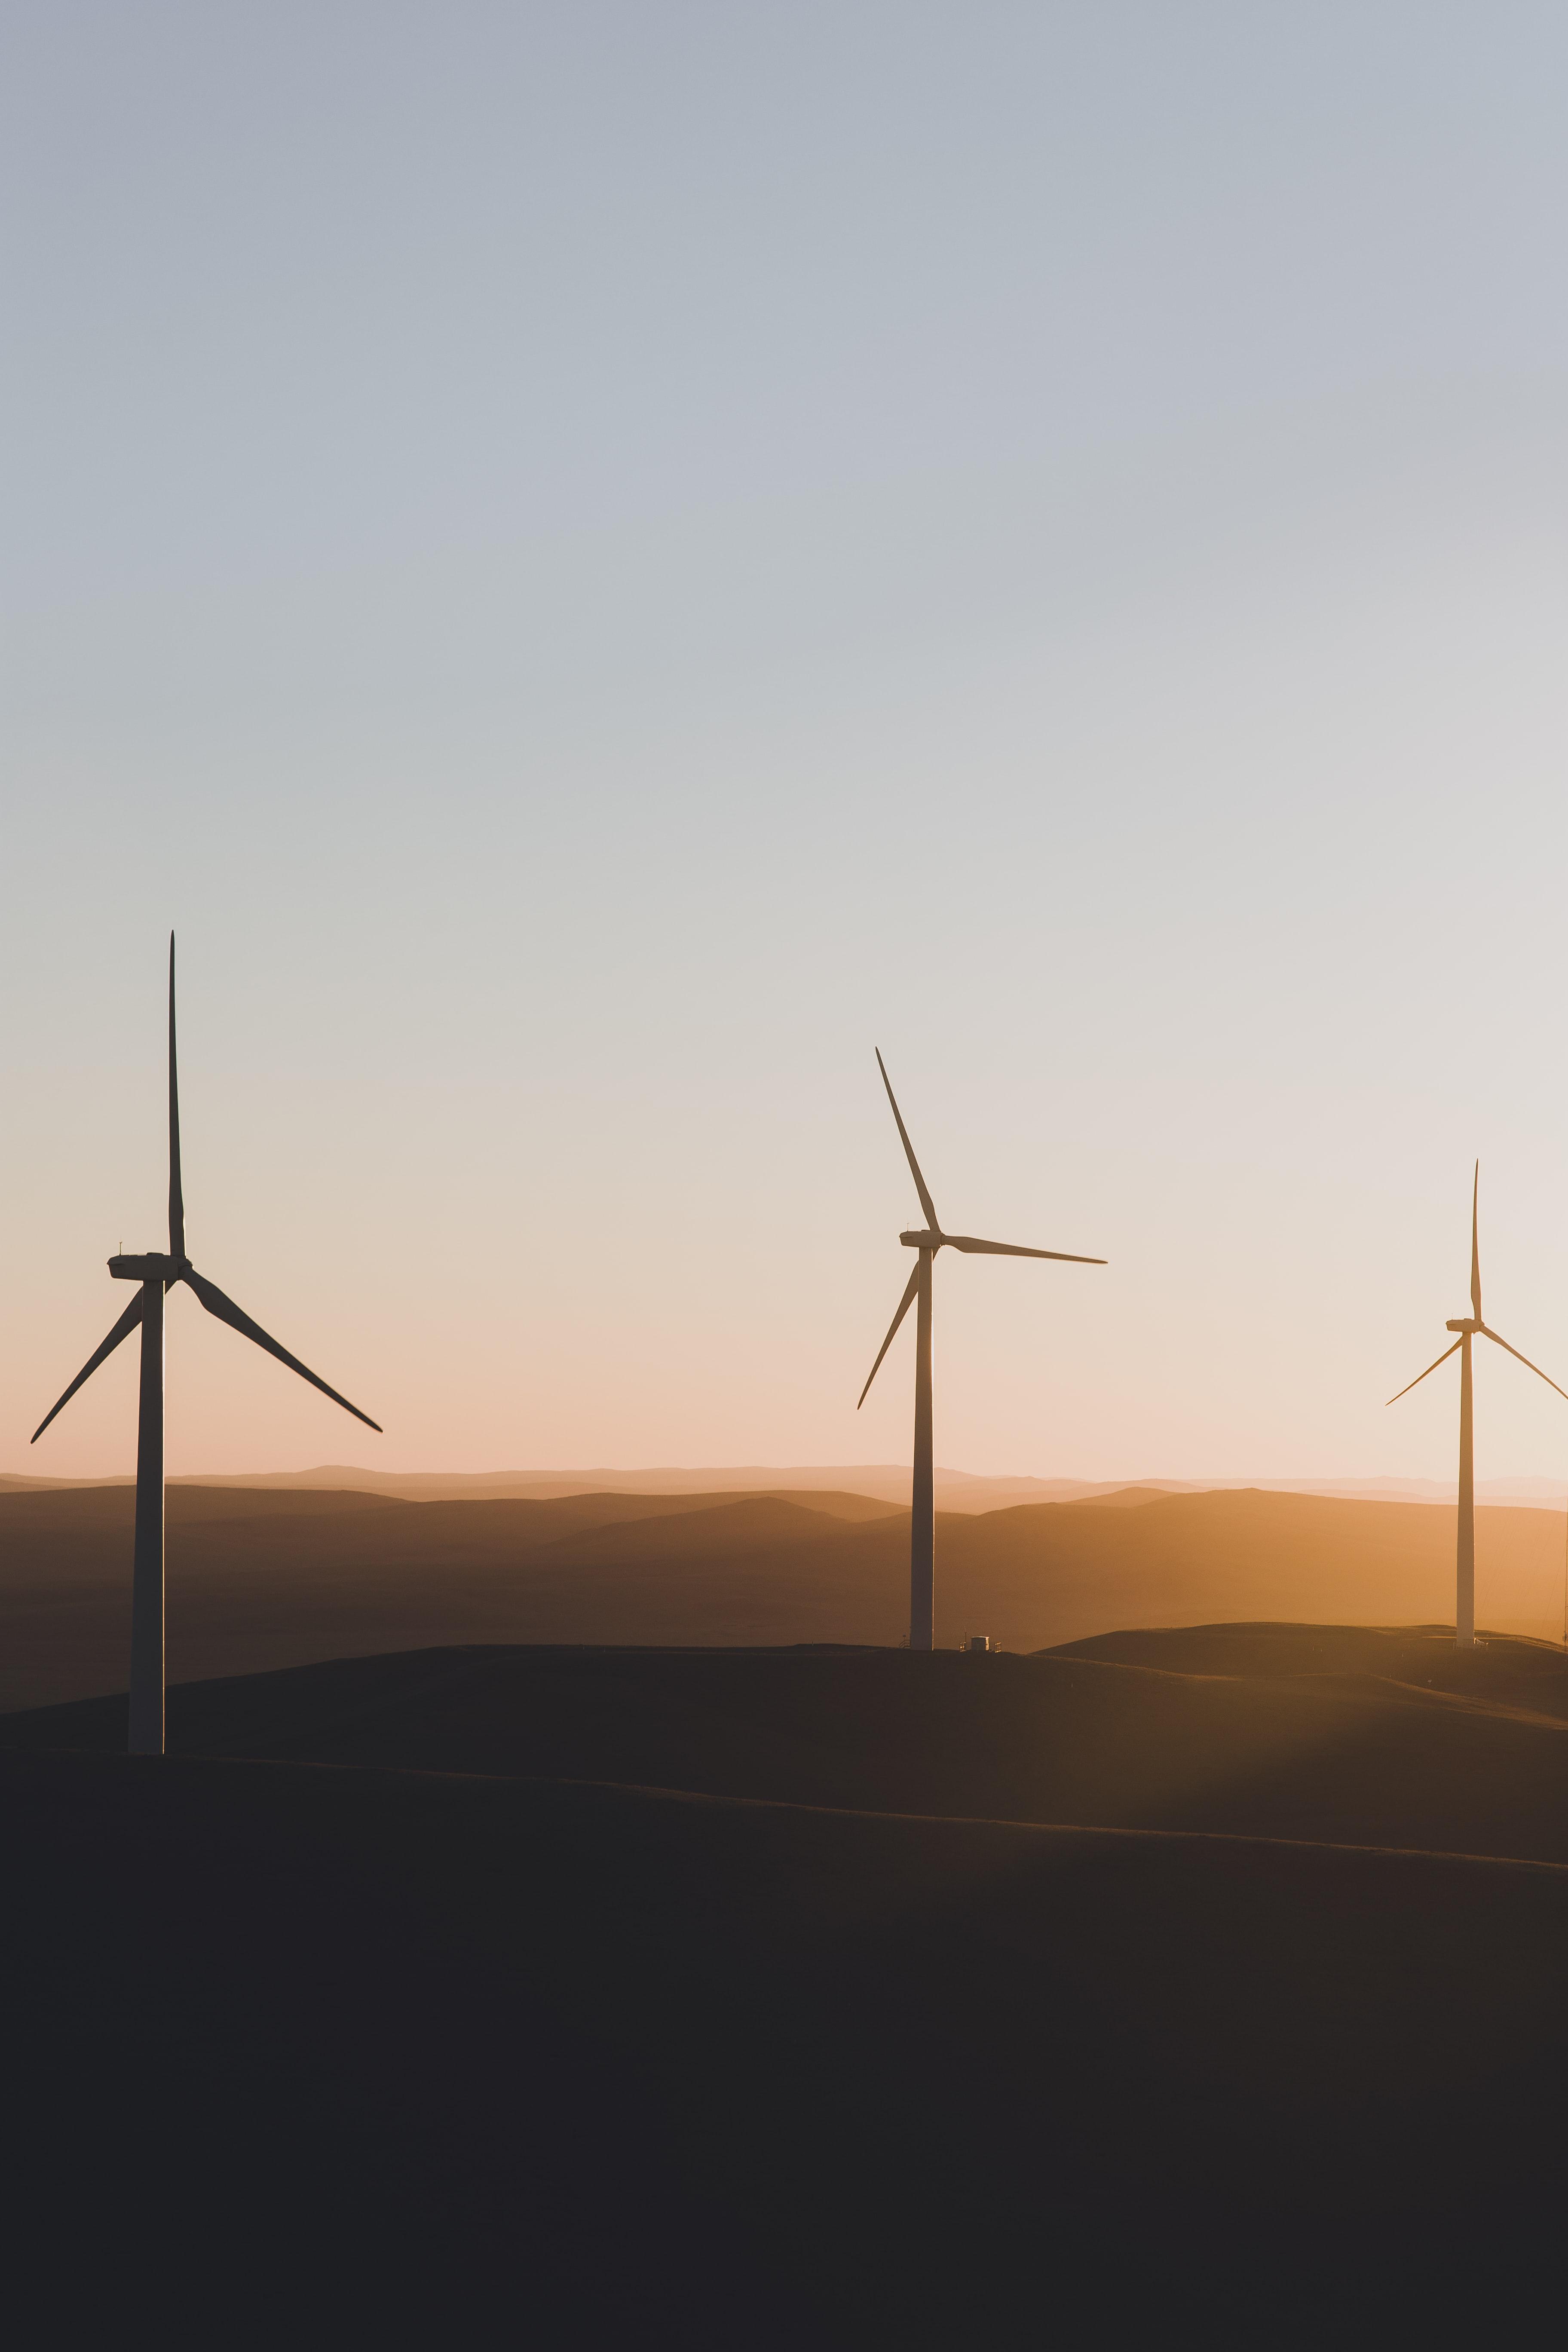 3 Wind turbines at sunset